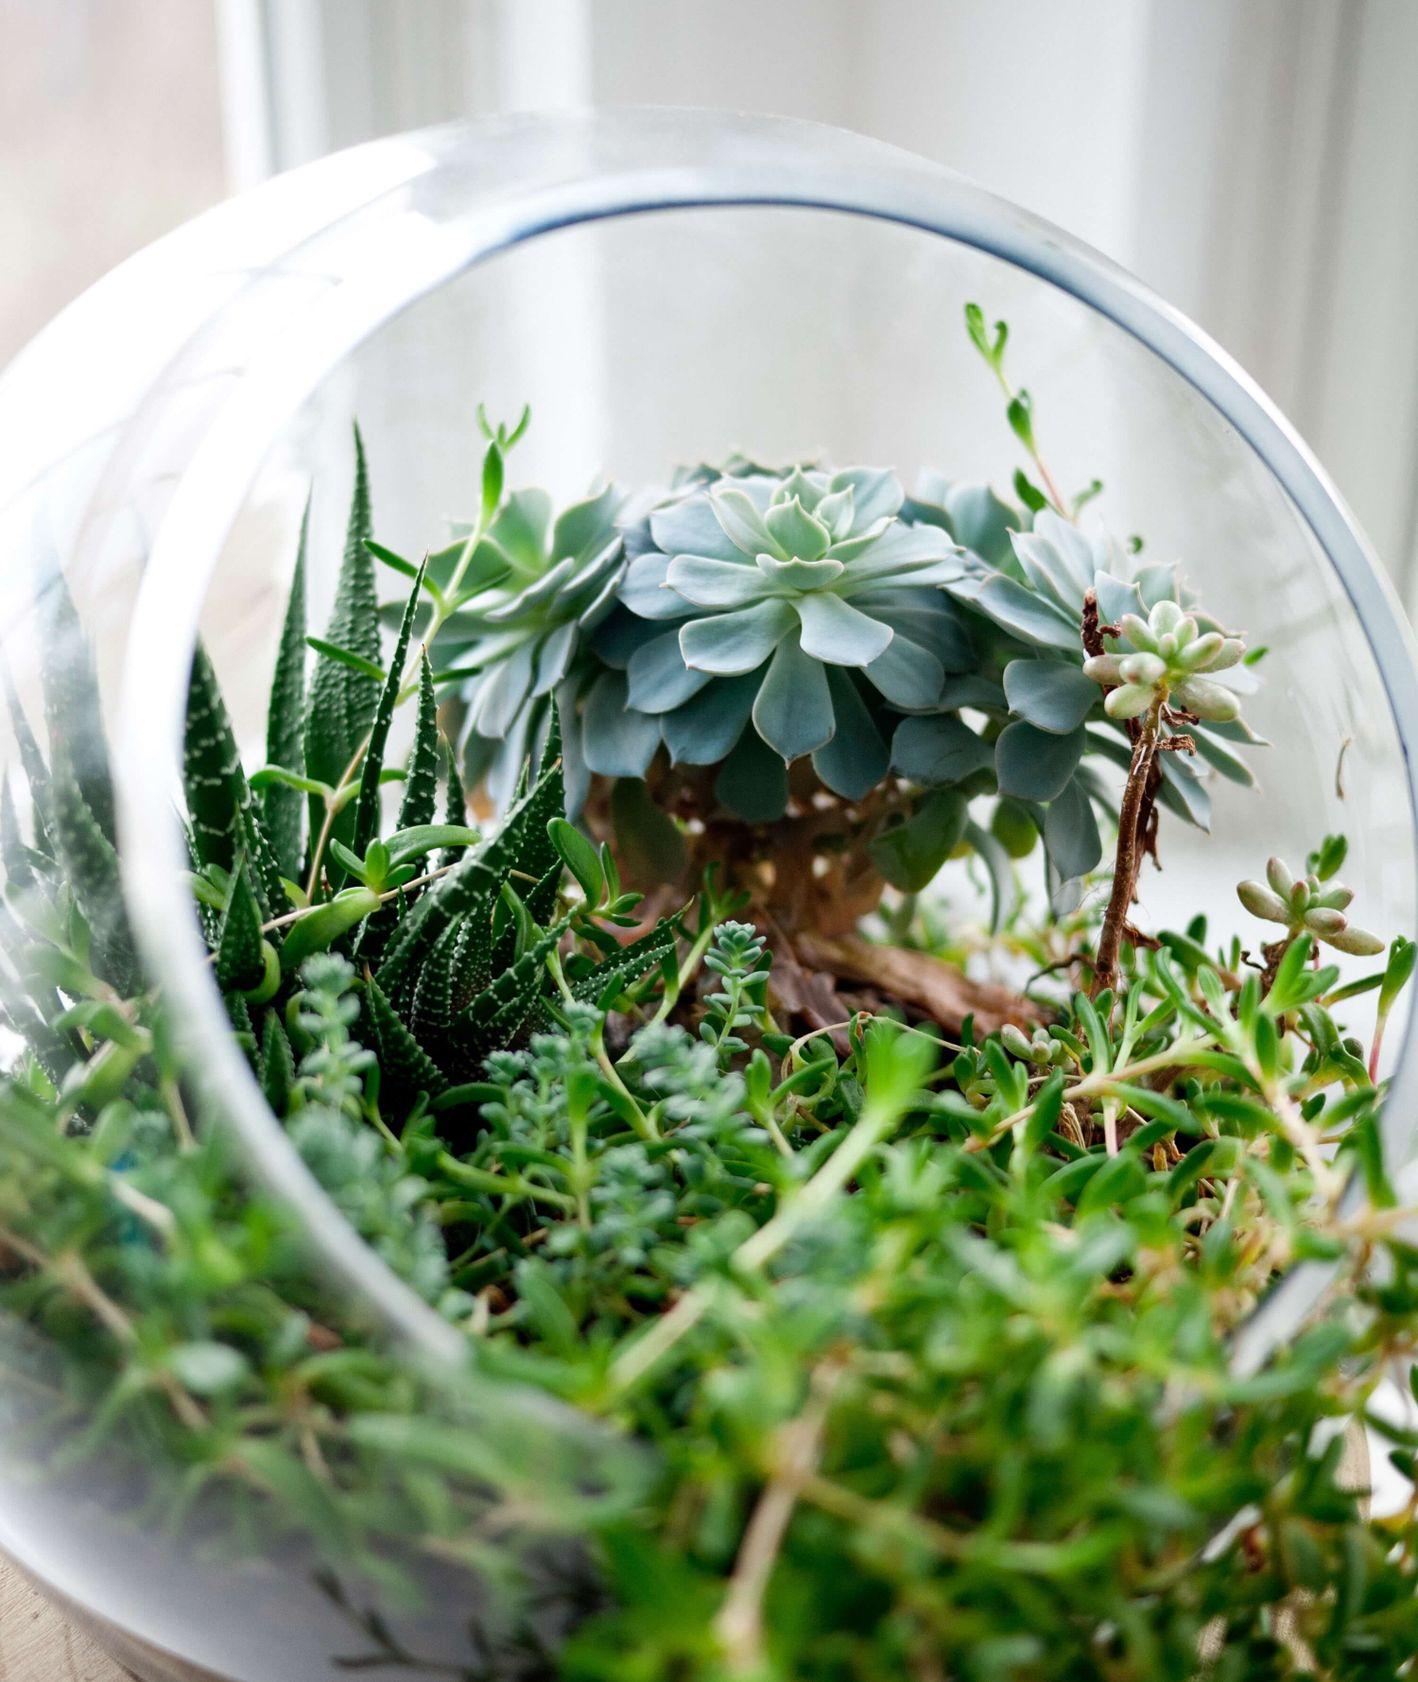 Las w szklanym słoiku (fot. Jeff Sheldon)